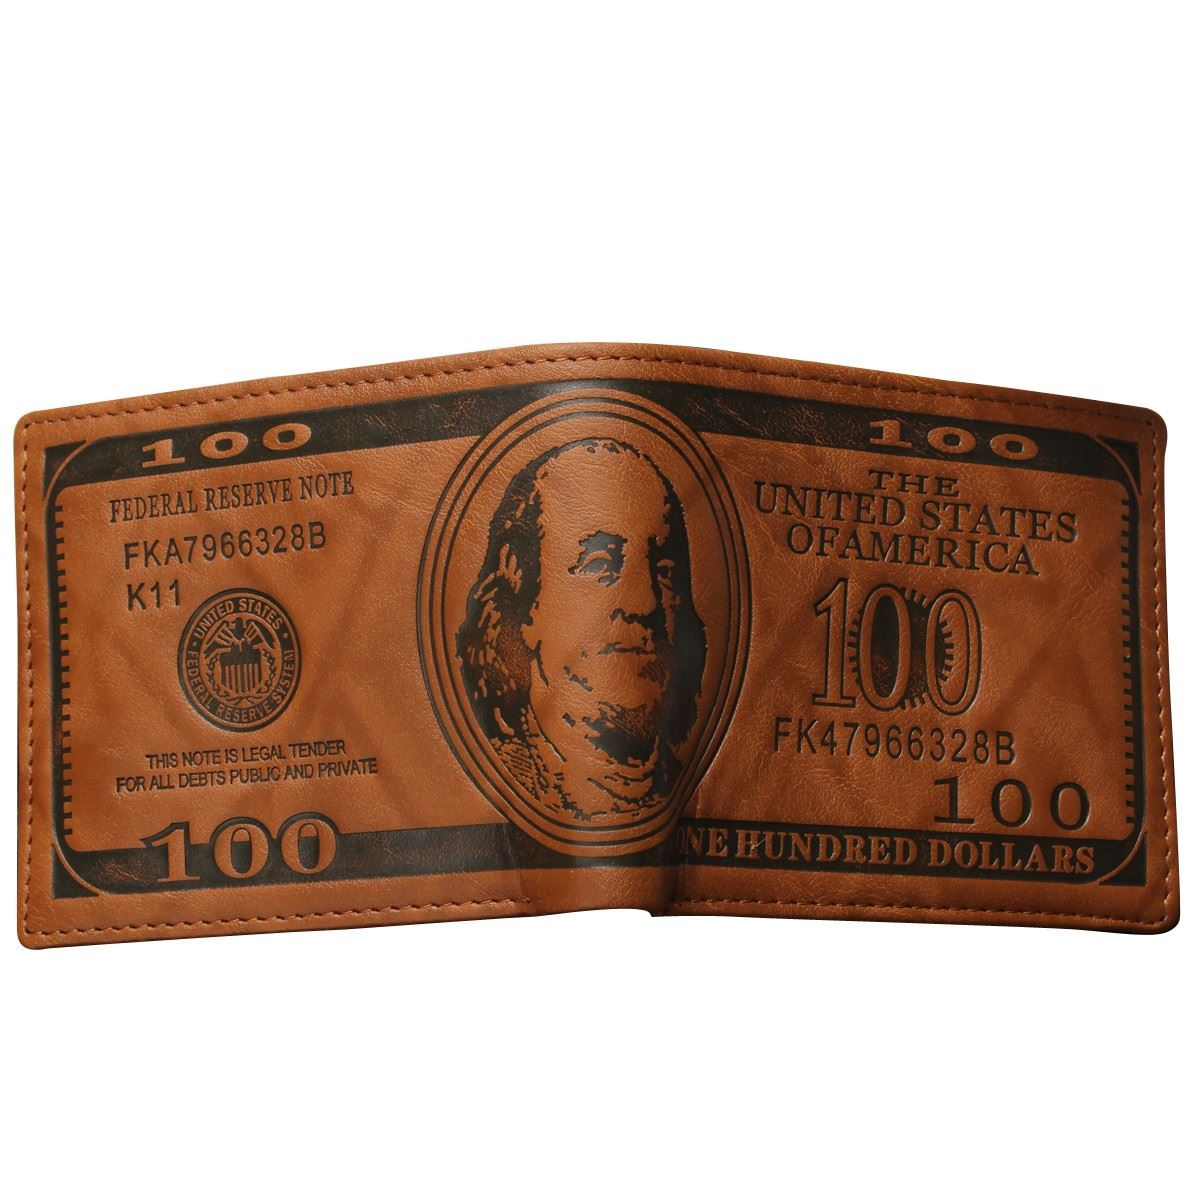 New Designer Men Wallet 100 Dollar Bill Design Short Purses Leather Male Pouch Notecase Retro Vintage Style Credit Card Holders<br><br>Aliexpress